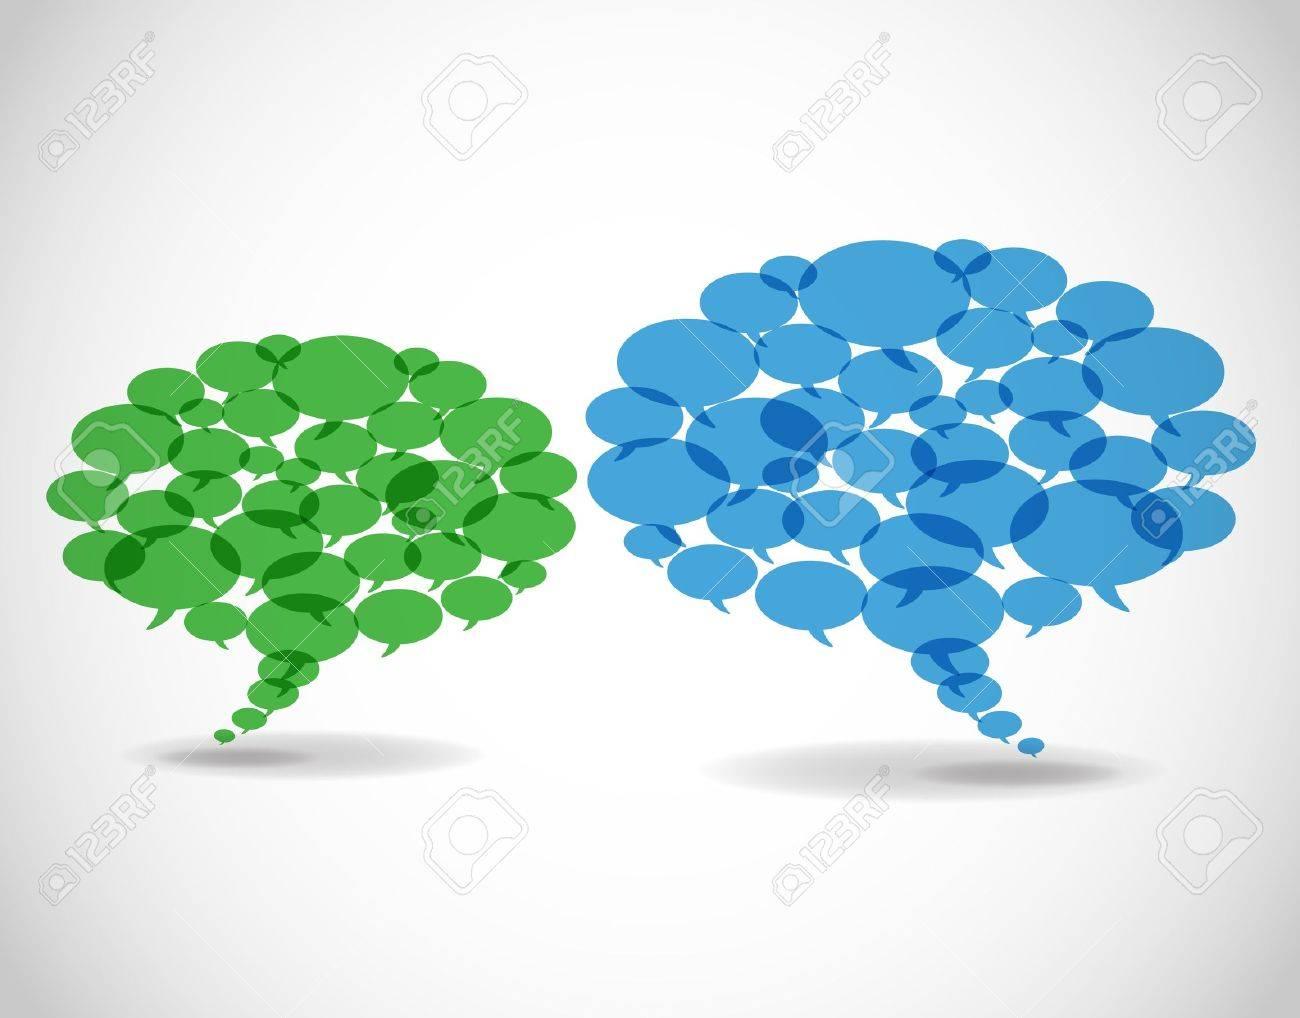 Abstract business speech bubbles. Stock Vector - 11660263